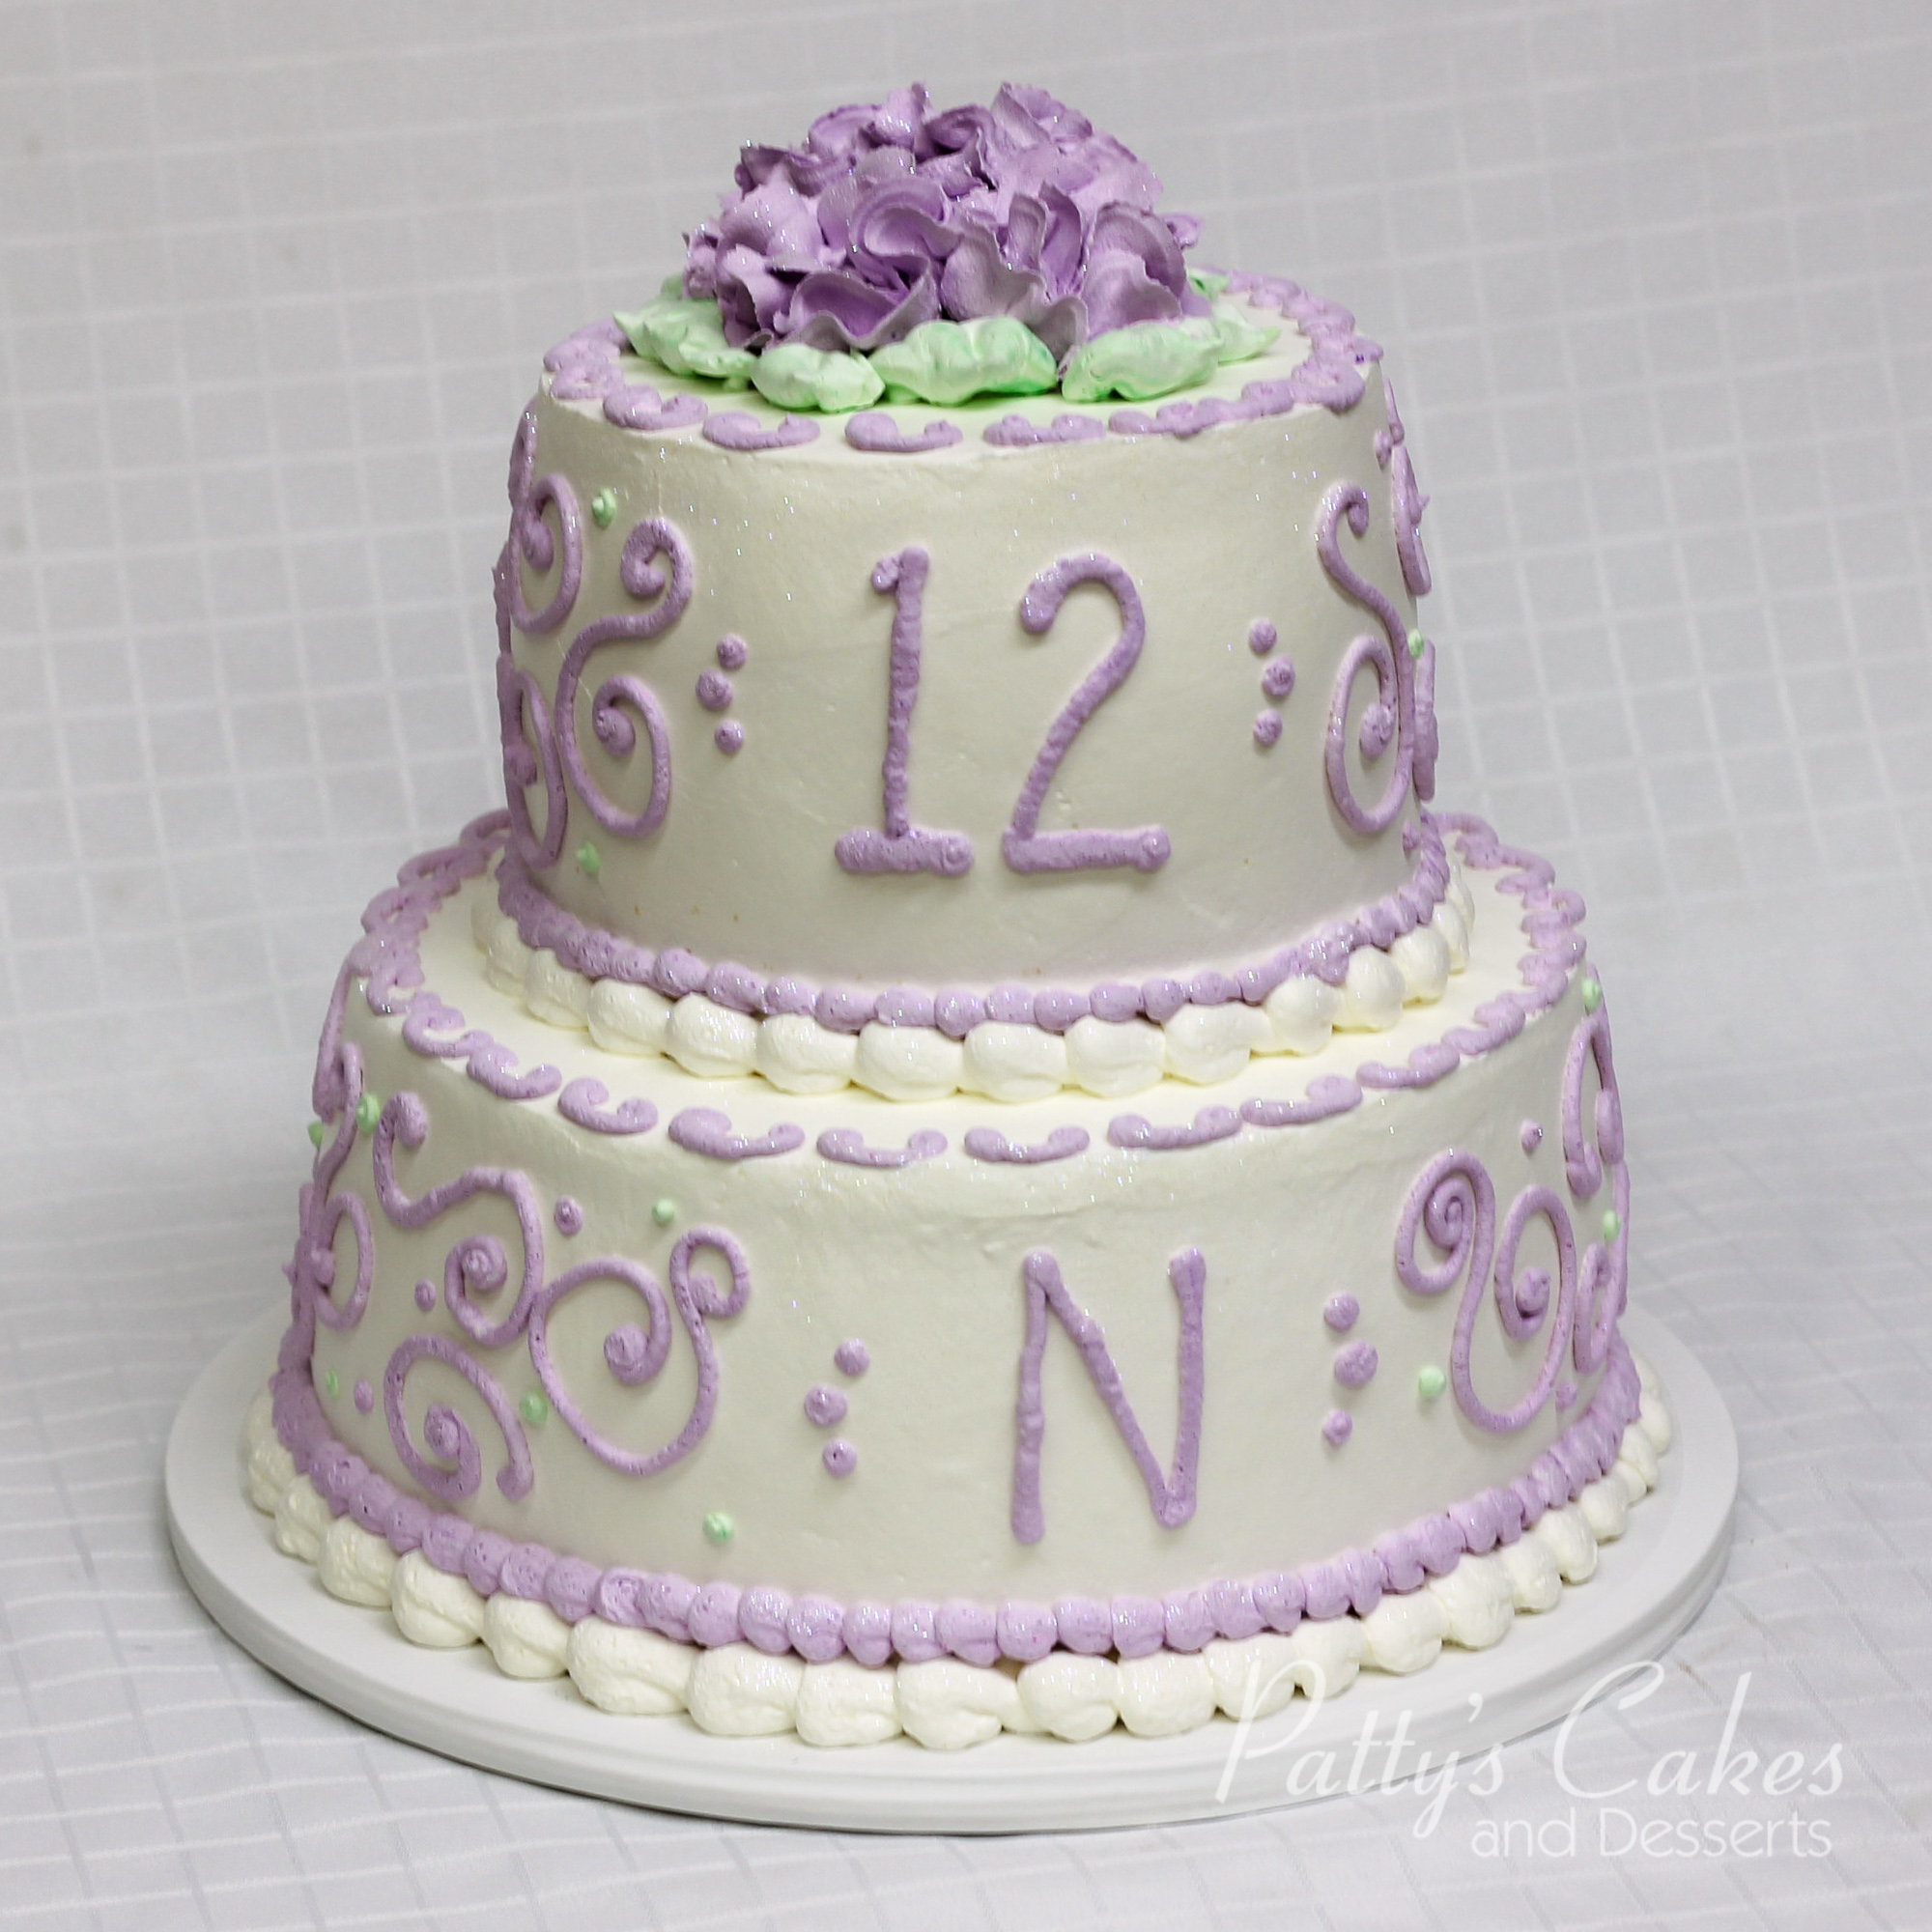 Similiar 2 Tier Purple Cake Keywords